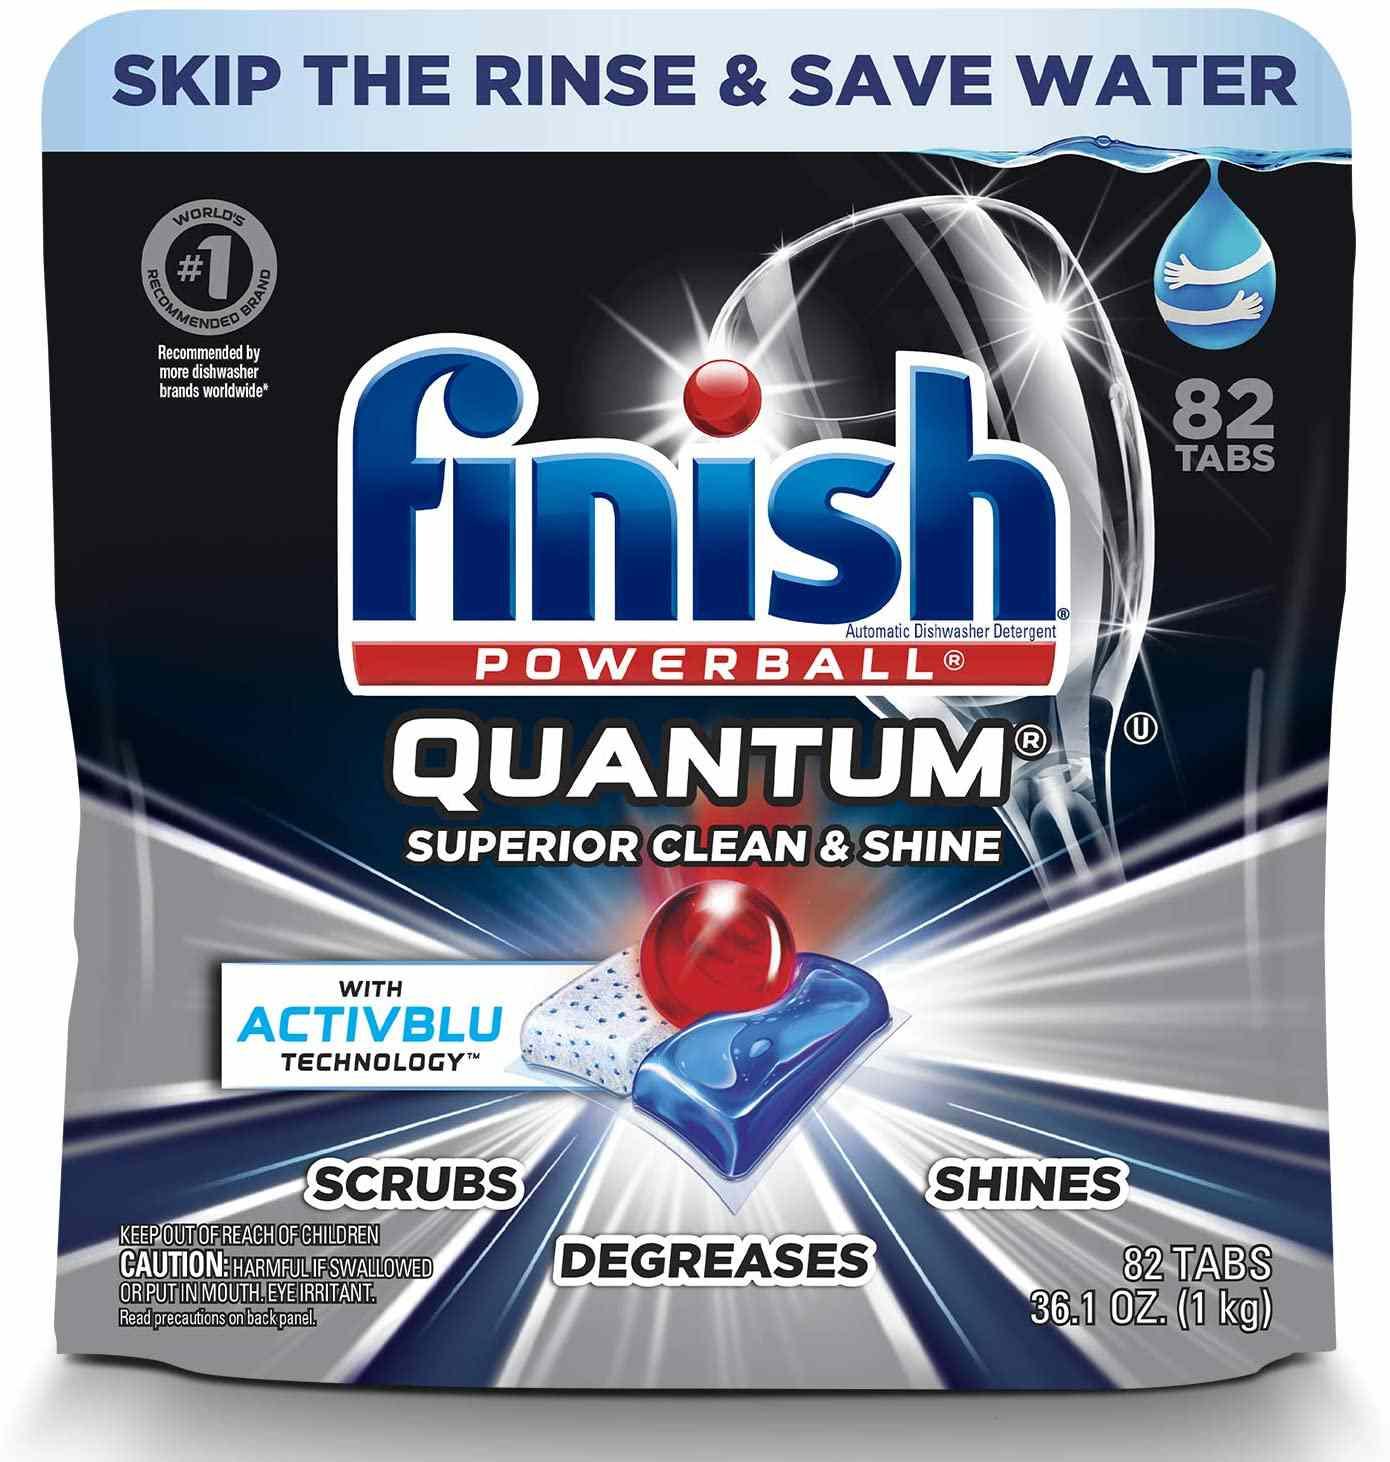 Powerball Quantum Dishwasher Detergent Tabs